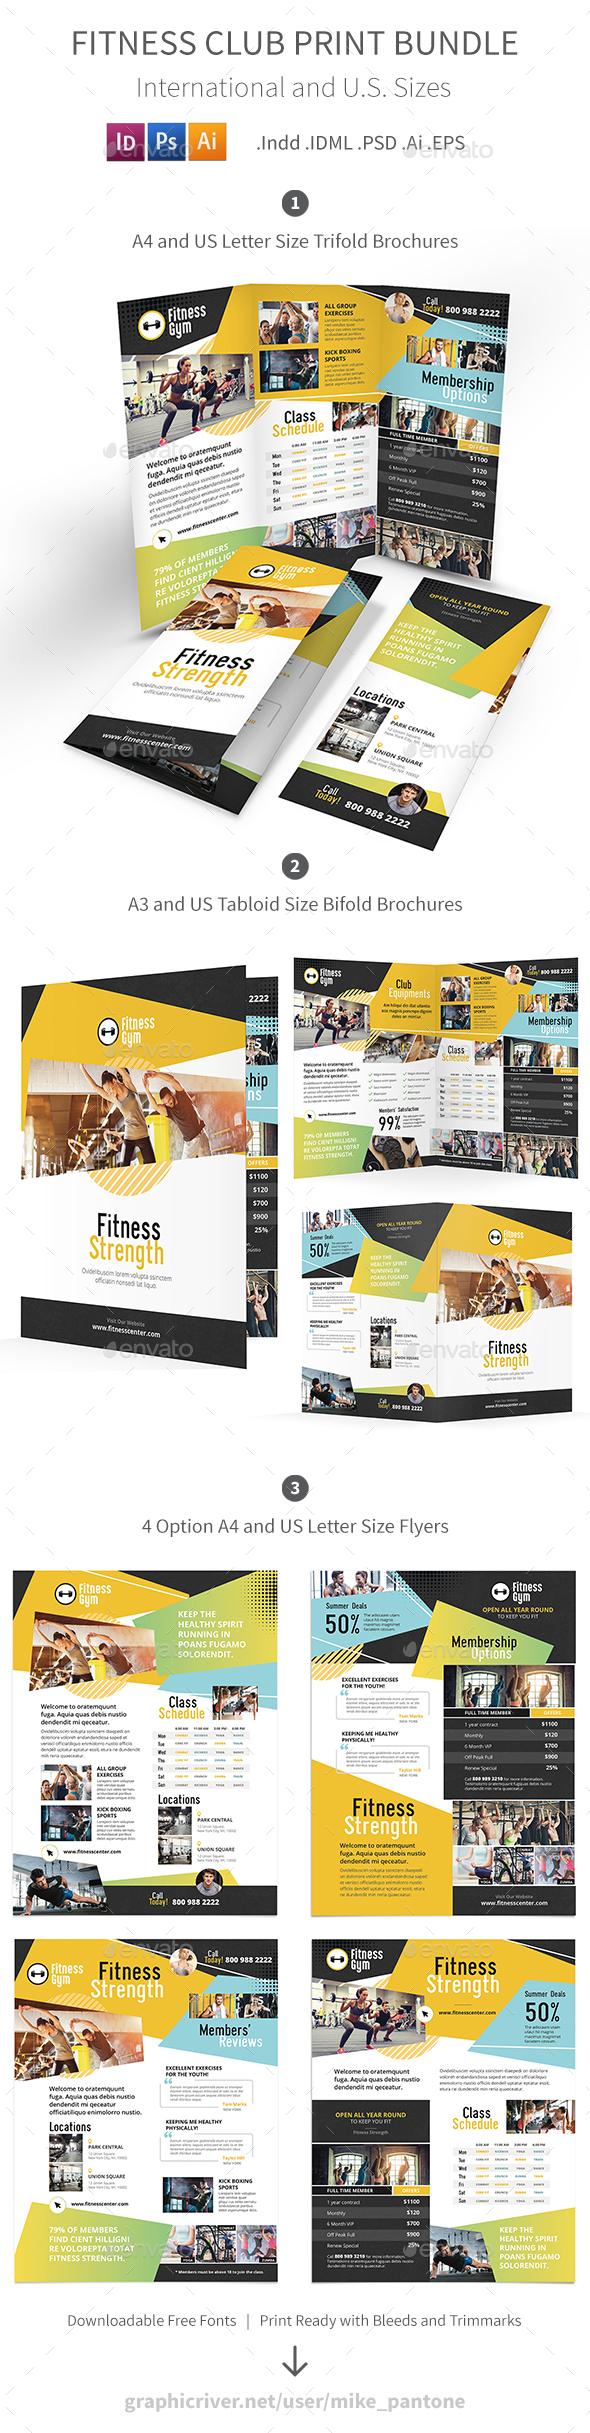 Fitness Club Print Bundle - Informational Brochures